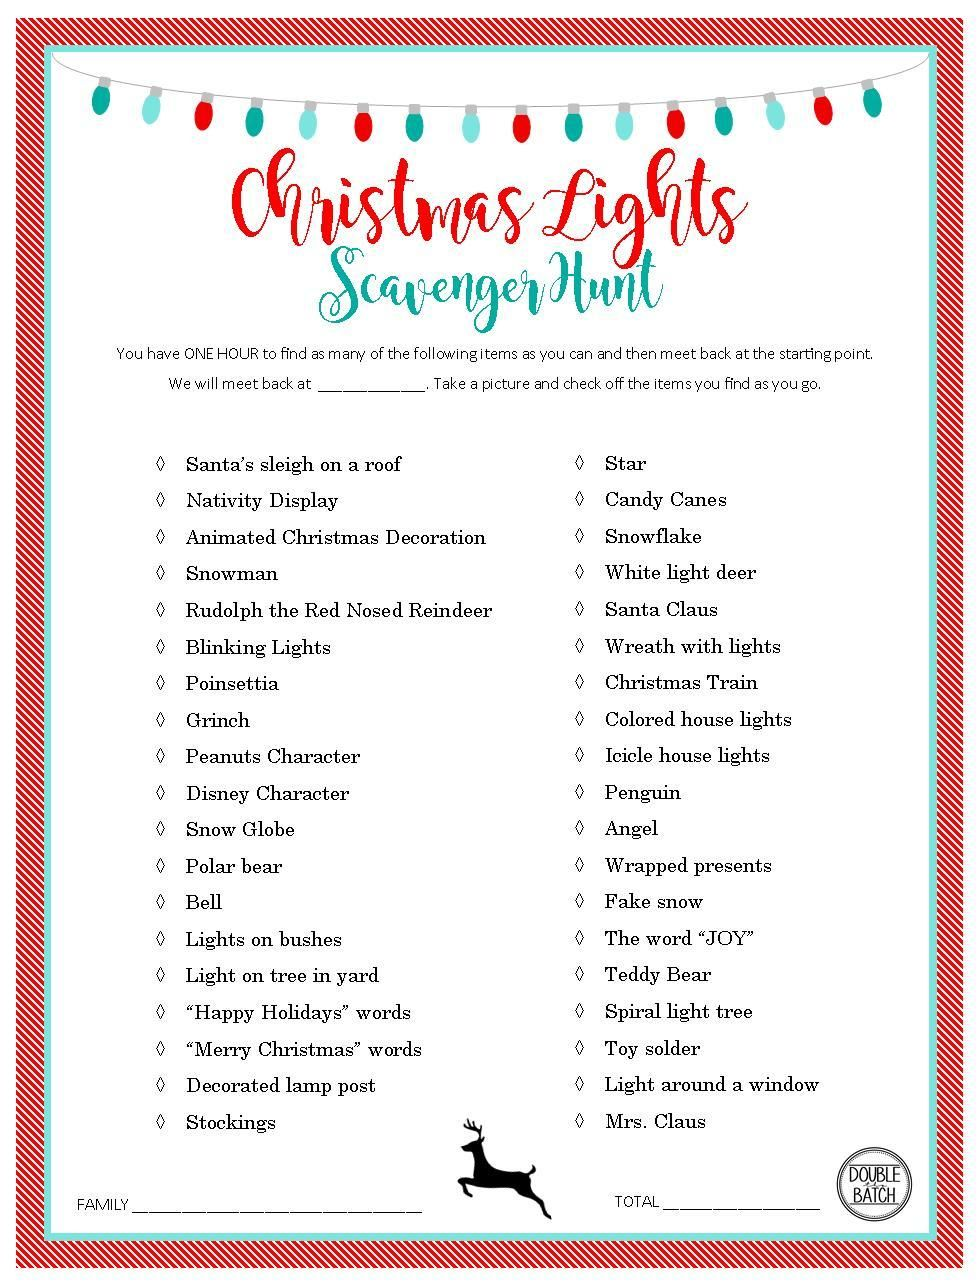 Free Printable Invitations Christmas Party Invitation